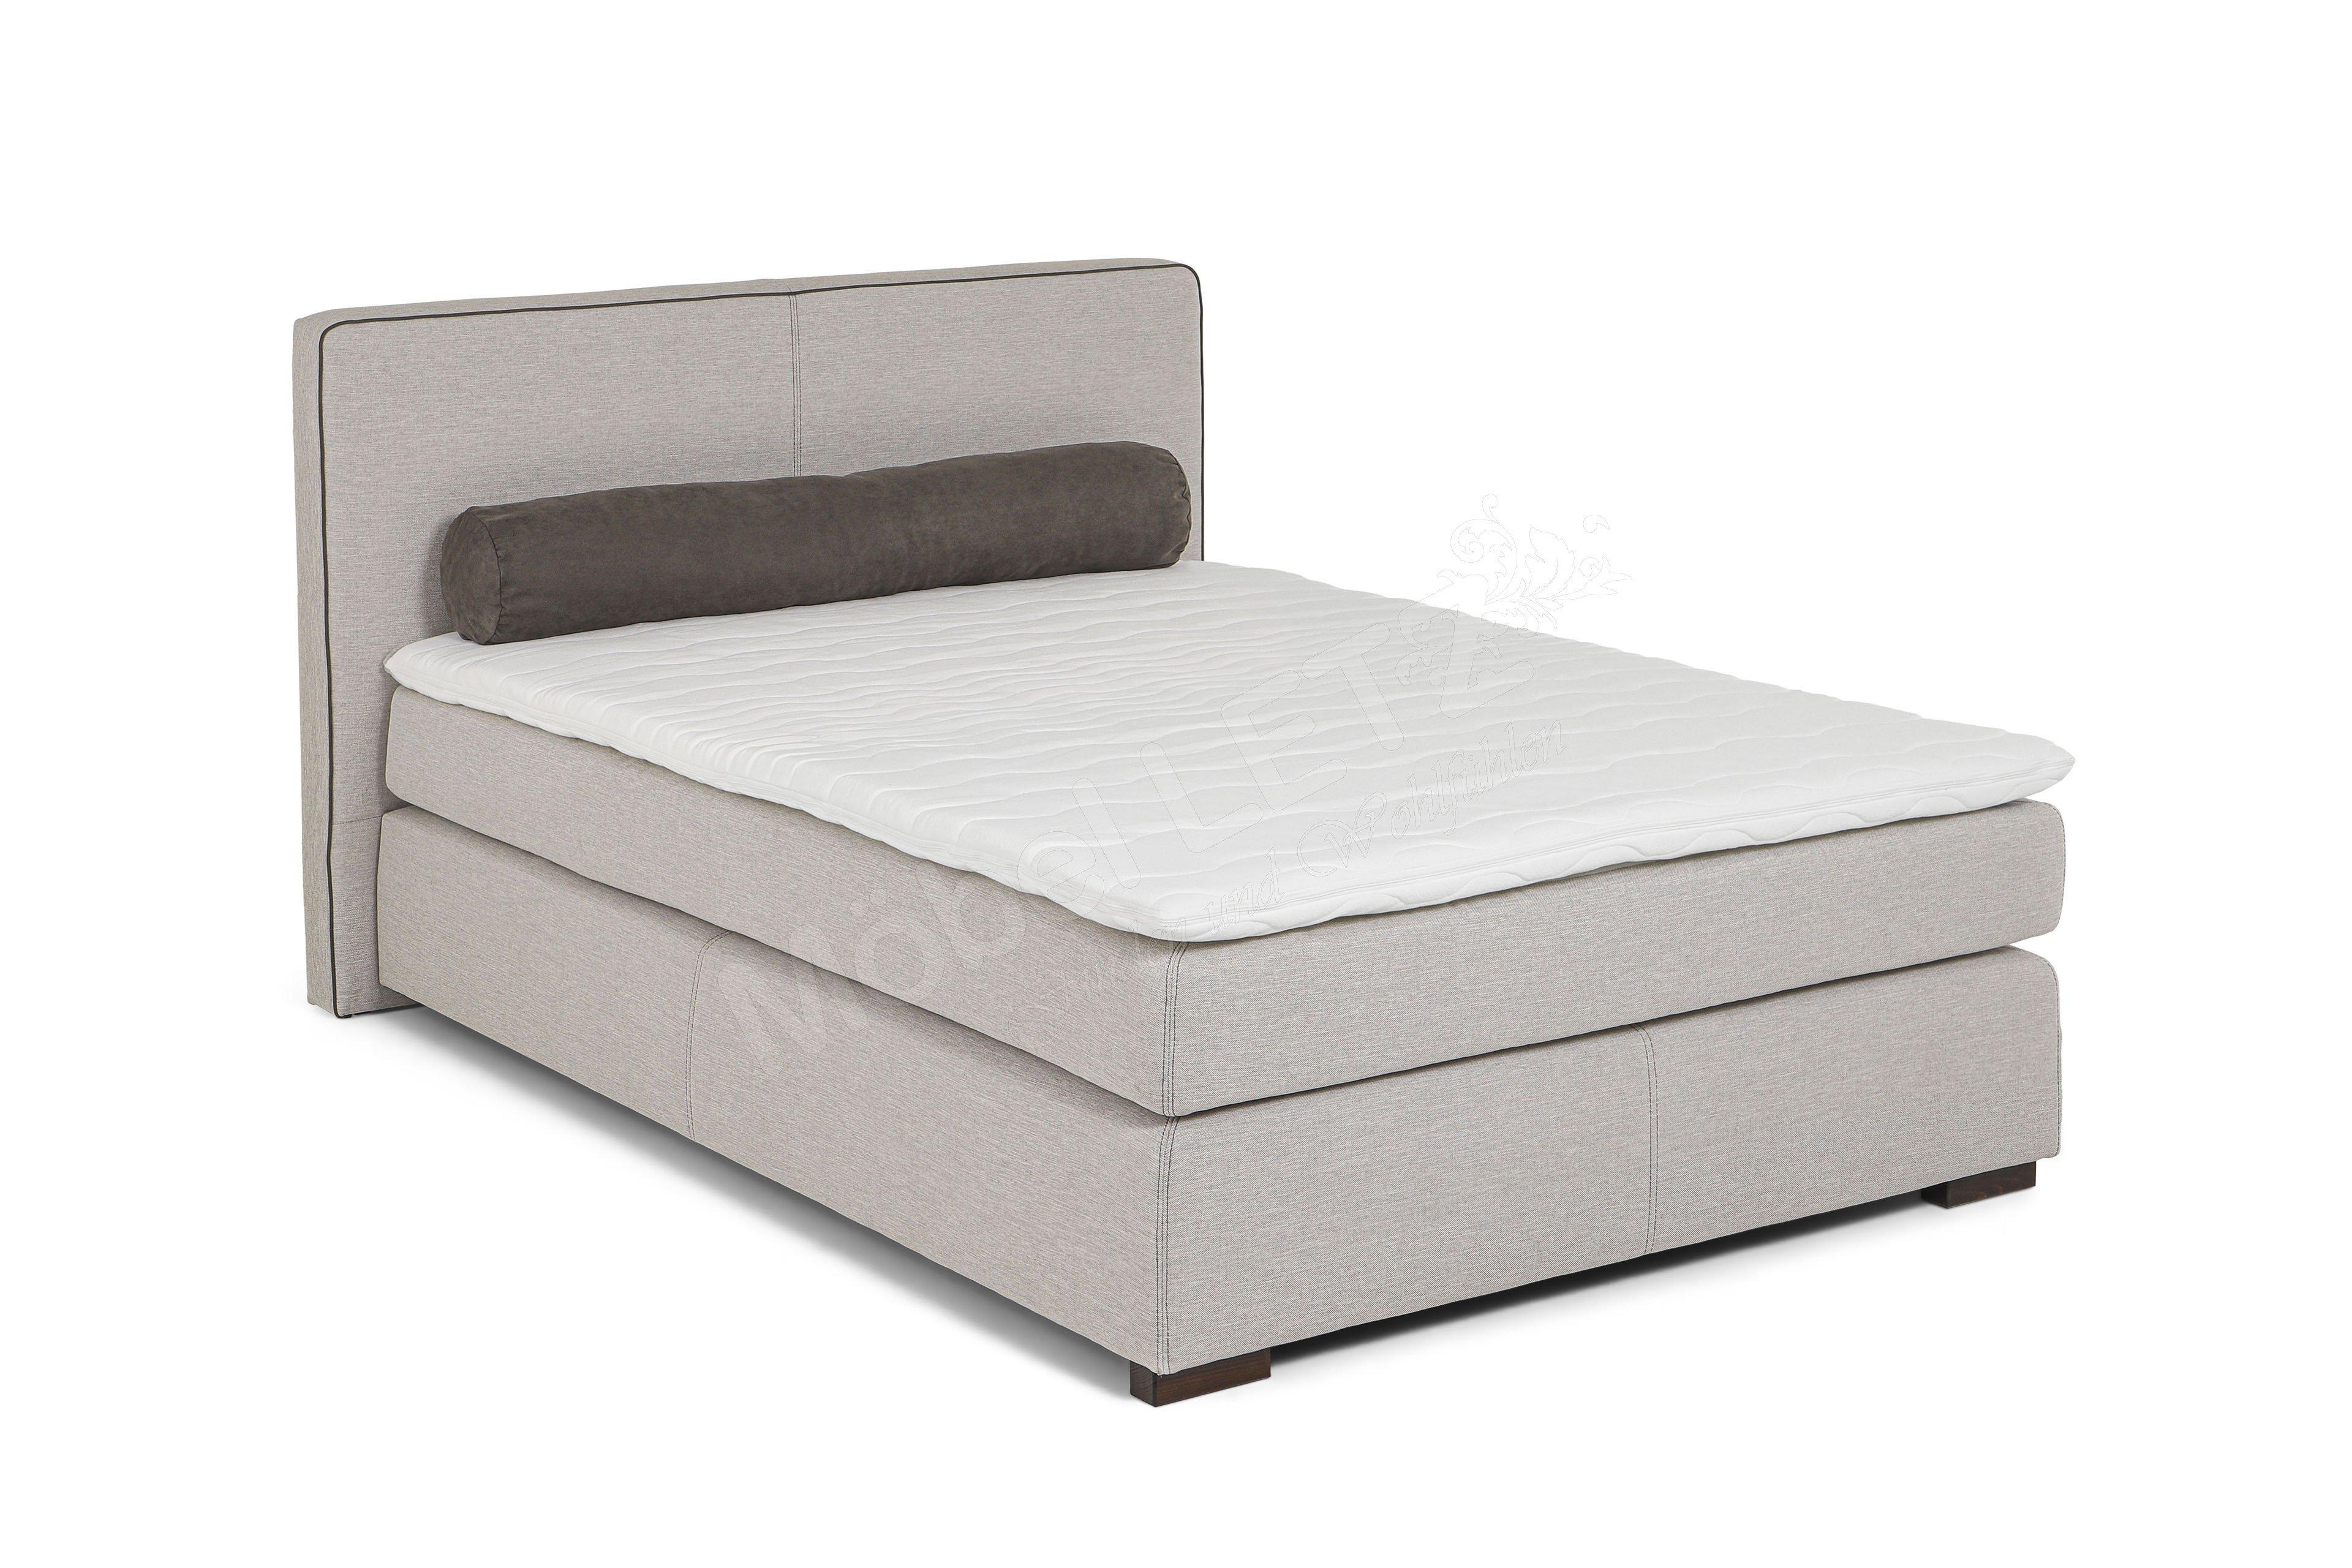 jockenh fer romantica boxspringbett beige grau m bel. Black Bedroom Furniture Sets. Home Design Ideas